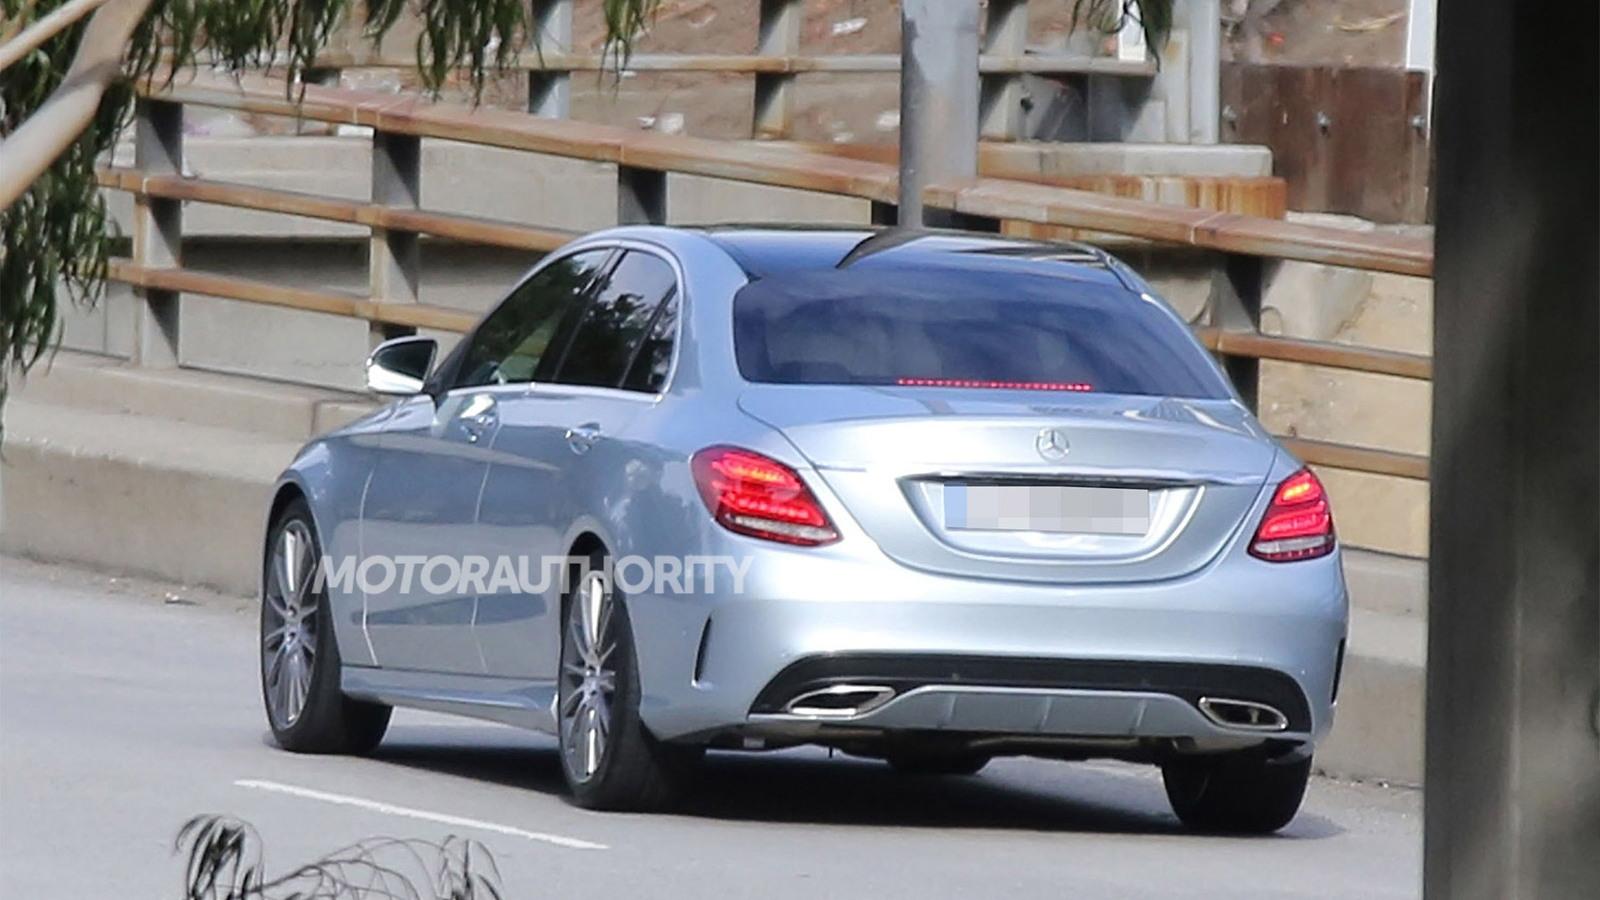 2015 Mercedes-Benz C-Class spy shots